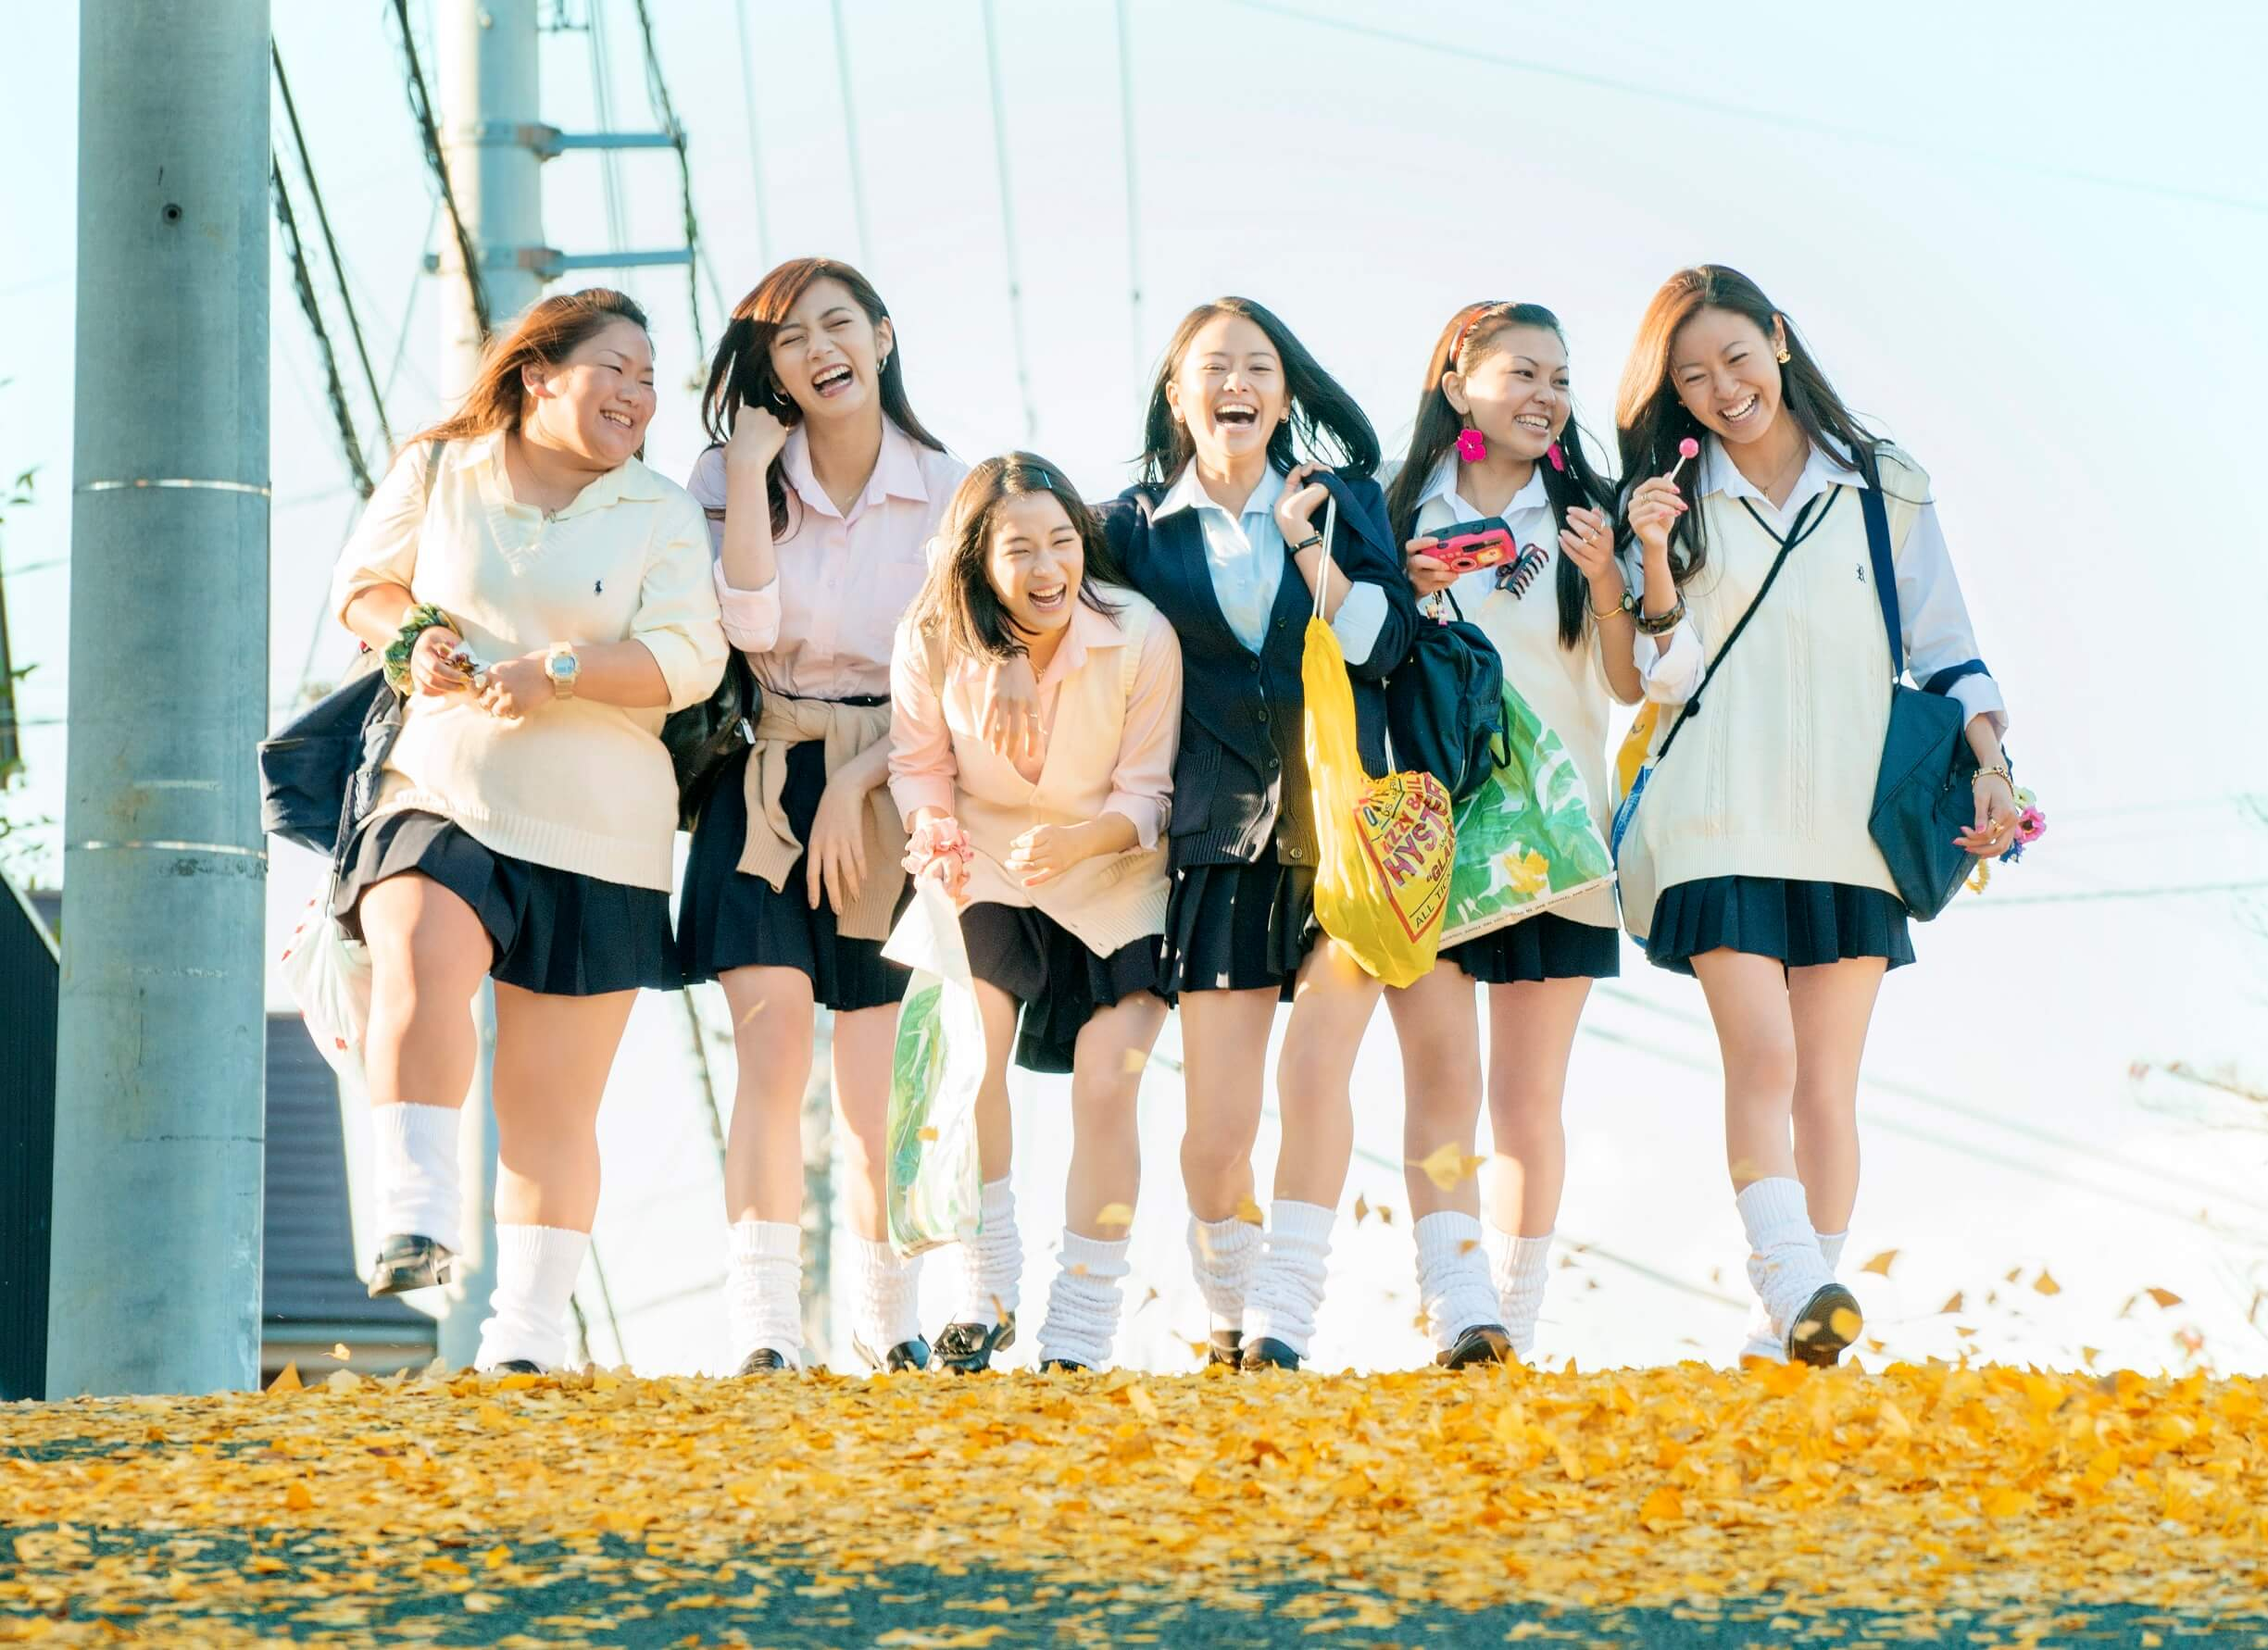 Sunny: Our Hearts Beat Together วันนั้น วันนี้ เพื่อนกันตลอดไป